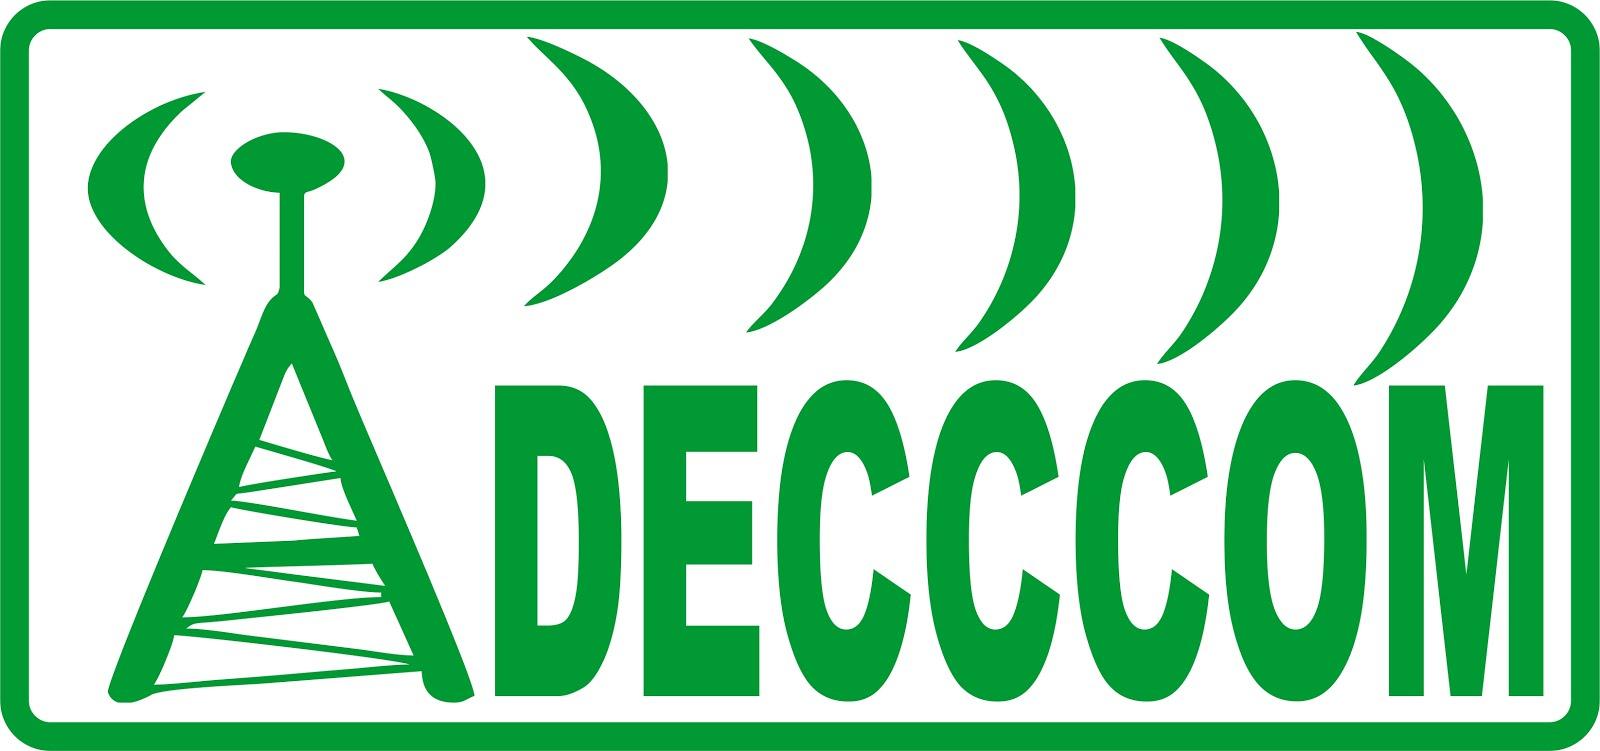 ADECCCOM